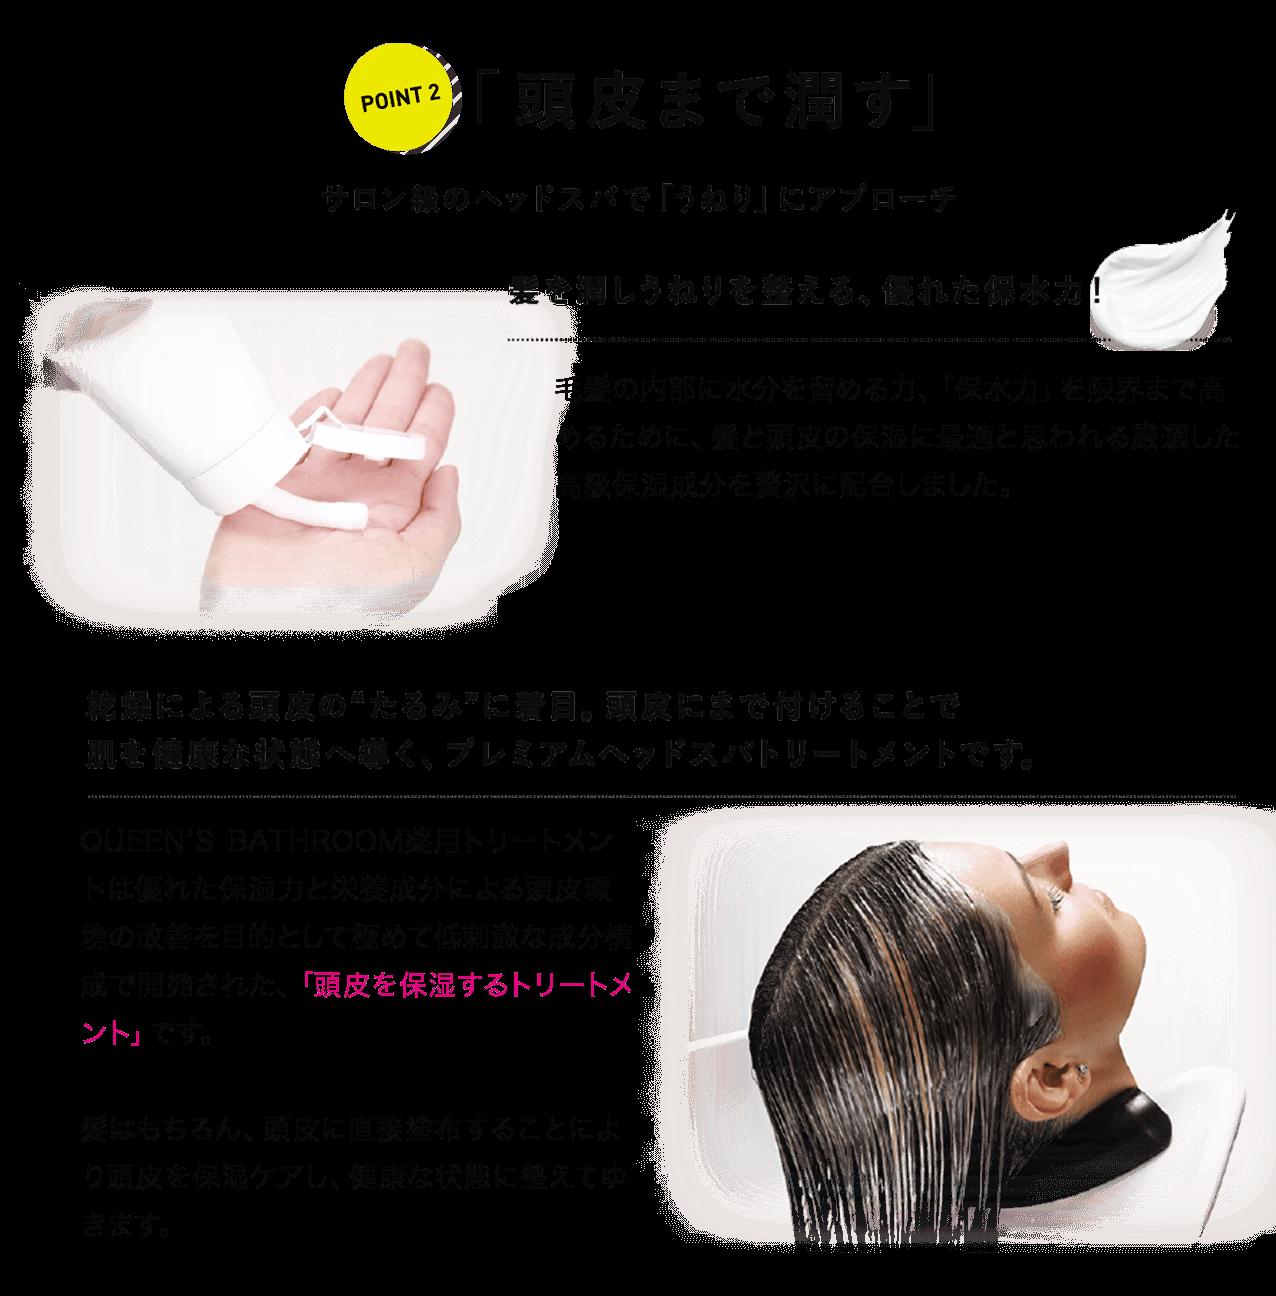 POINT2 「頭皮まで潤す」サロン級のヘッドスパで「うねり」にアプローチ 毛髪の内部に水分を留める力、「保水力」を限界まで高めるために、髪と頭皮の保湿に最適と思われる厳選した高級保湿成分を贅沢に配合しました。QUEEN'S BATHROOM薬用トリートメントは優れた保湿力と栄養成分による頭皮環境の改善を目的として極めて低刺激な成分構成で開発された、「頭皮を保湿するトリートメント」です。髪はもちろん、頭皮に直接塗布することにより頭皮を保湿ケアし、健康な状態に整えてゆきます。